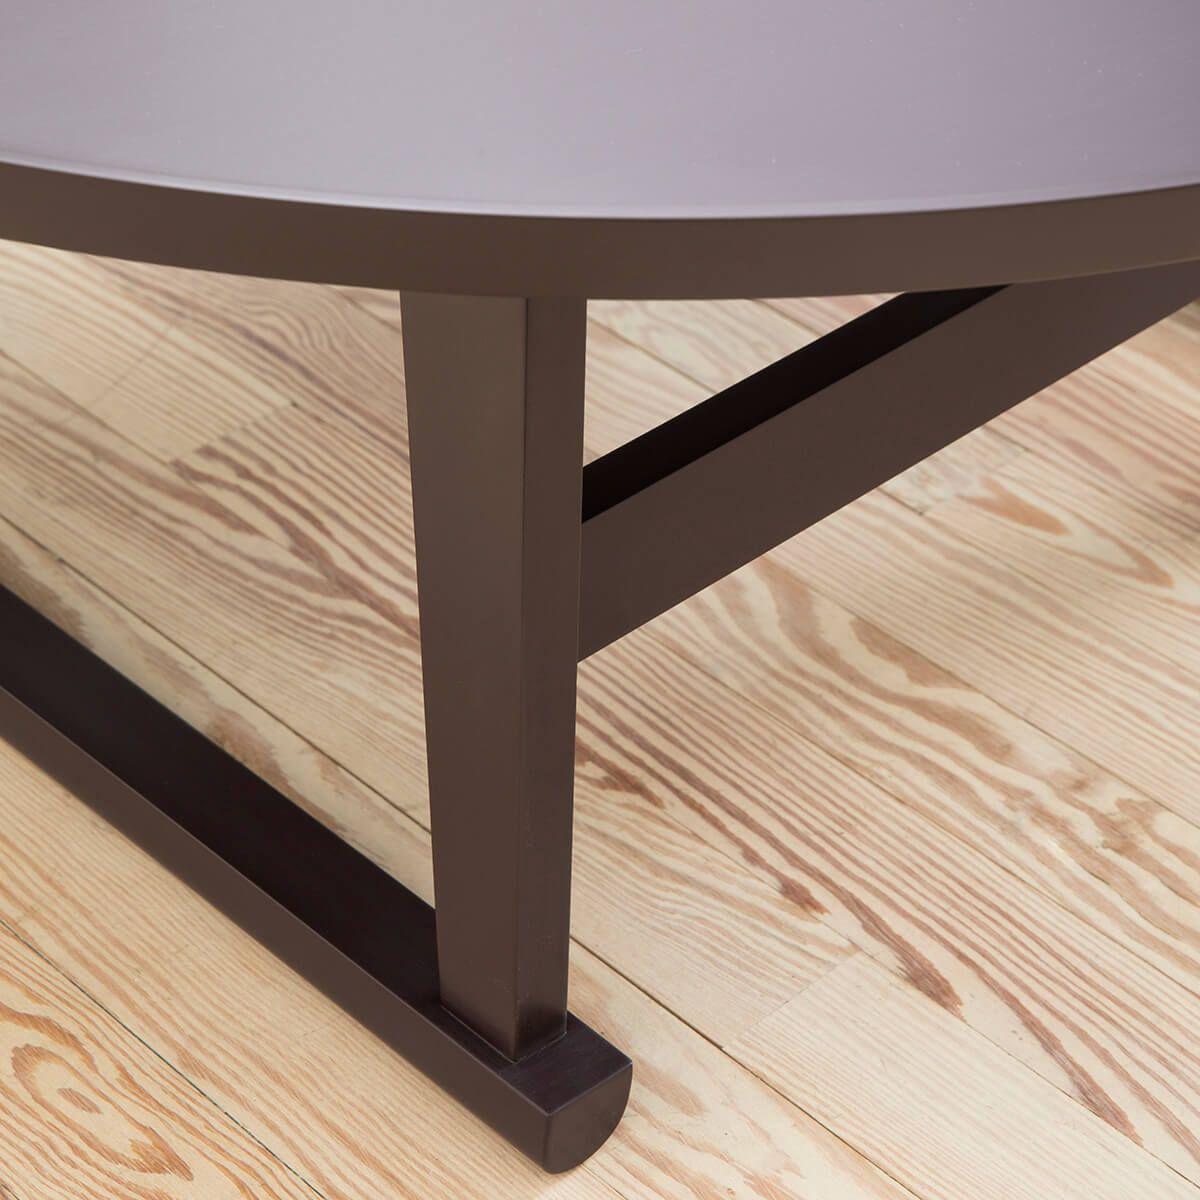 Round Table Recipio De Maxalto Naharro Furniture Online Store Round Coffee Table Table Coffee Table [ 1200 x 1200 Pixel ]